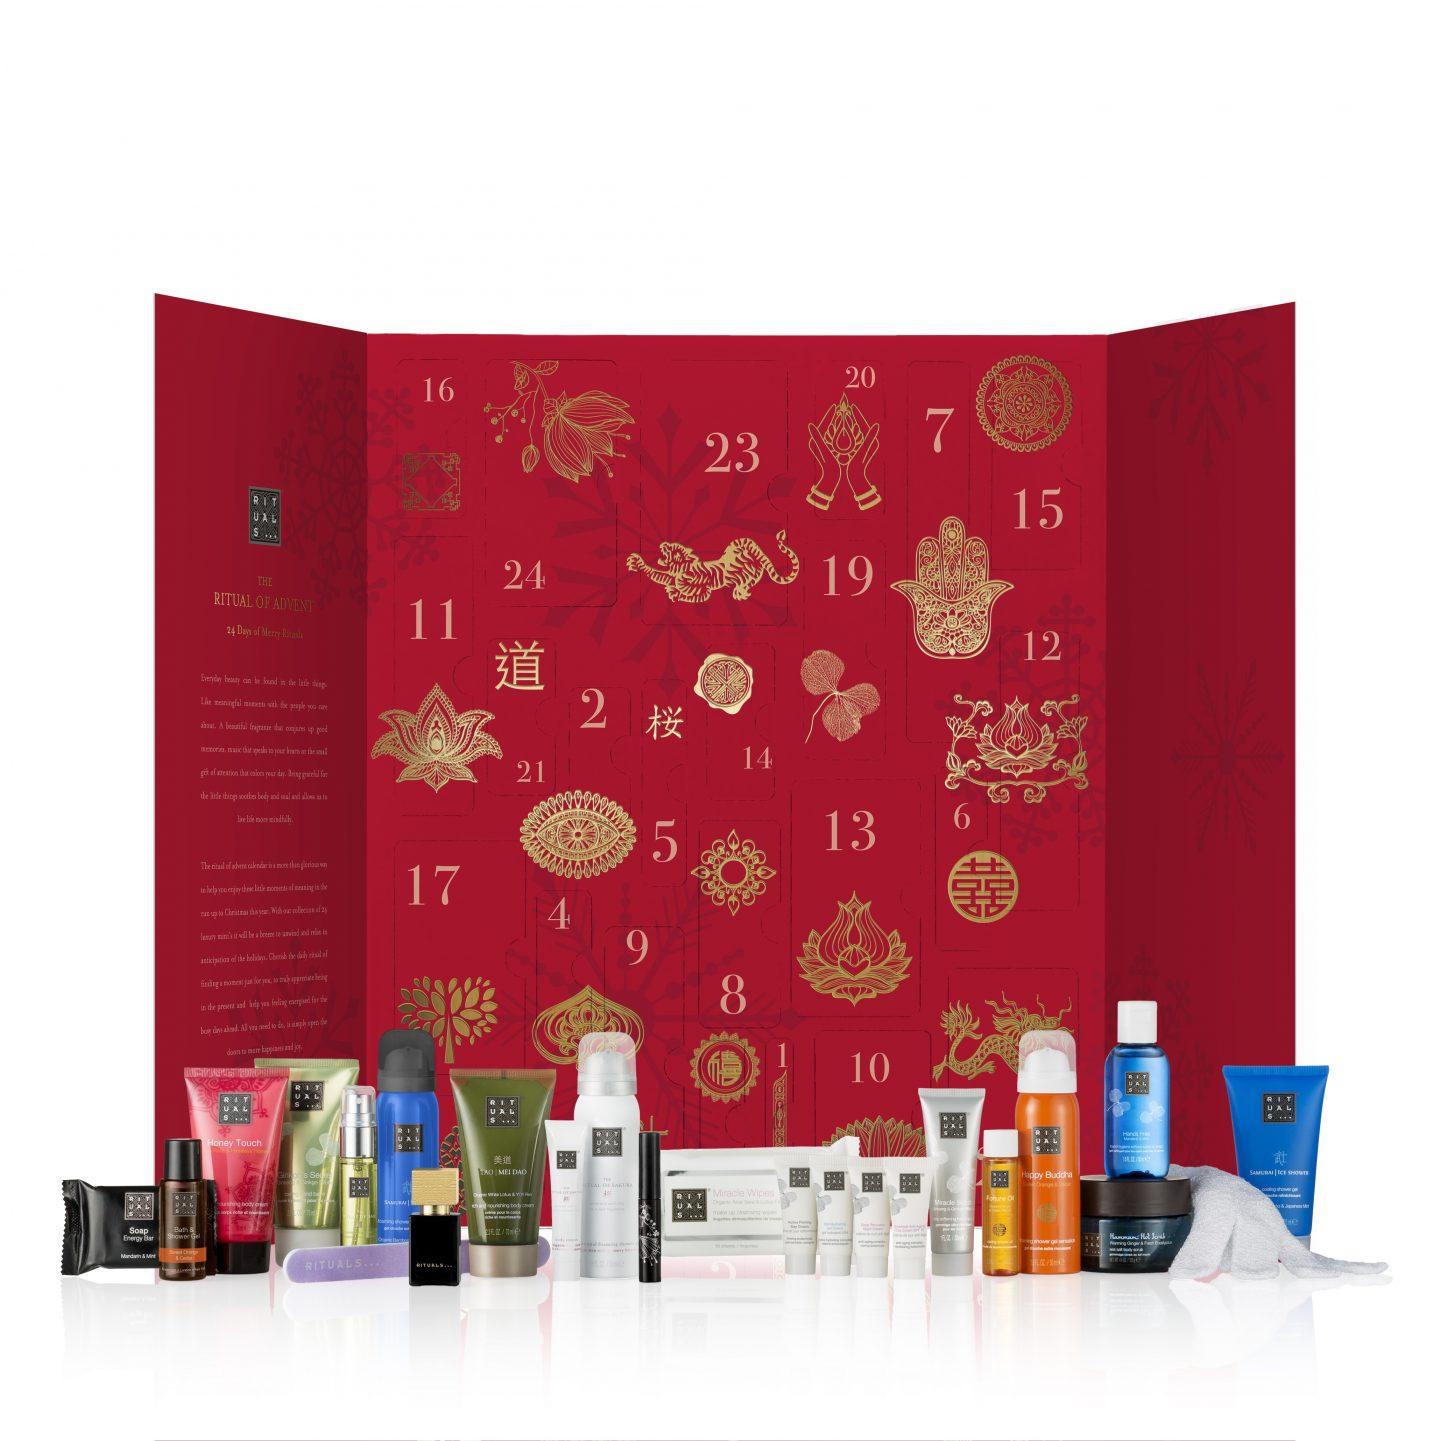 rituals advent calendar little luxuries beauty skincare cosmetics